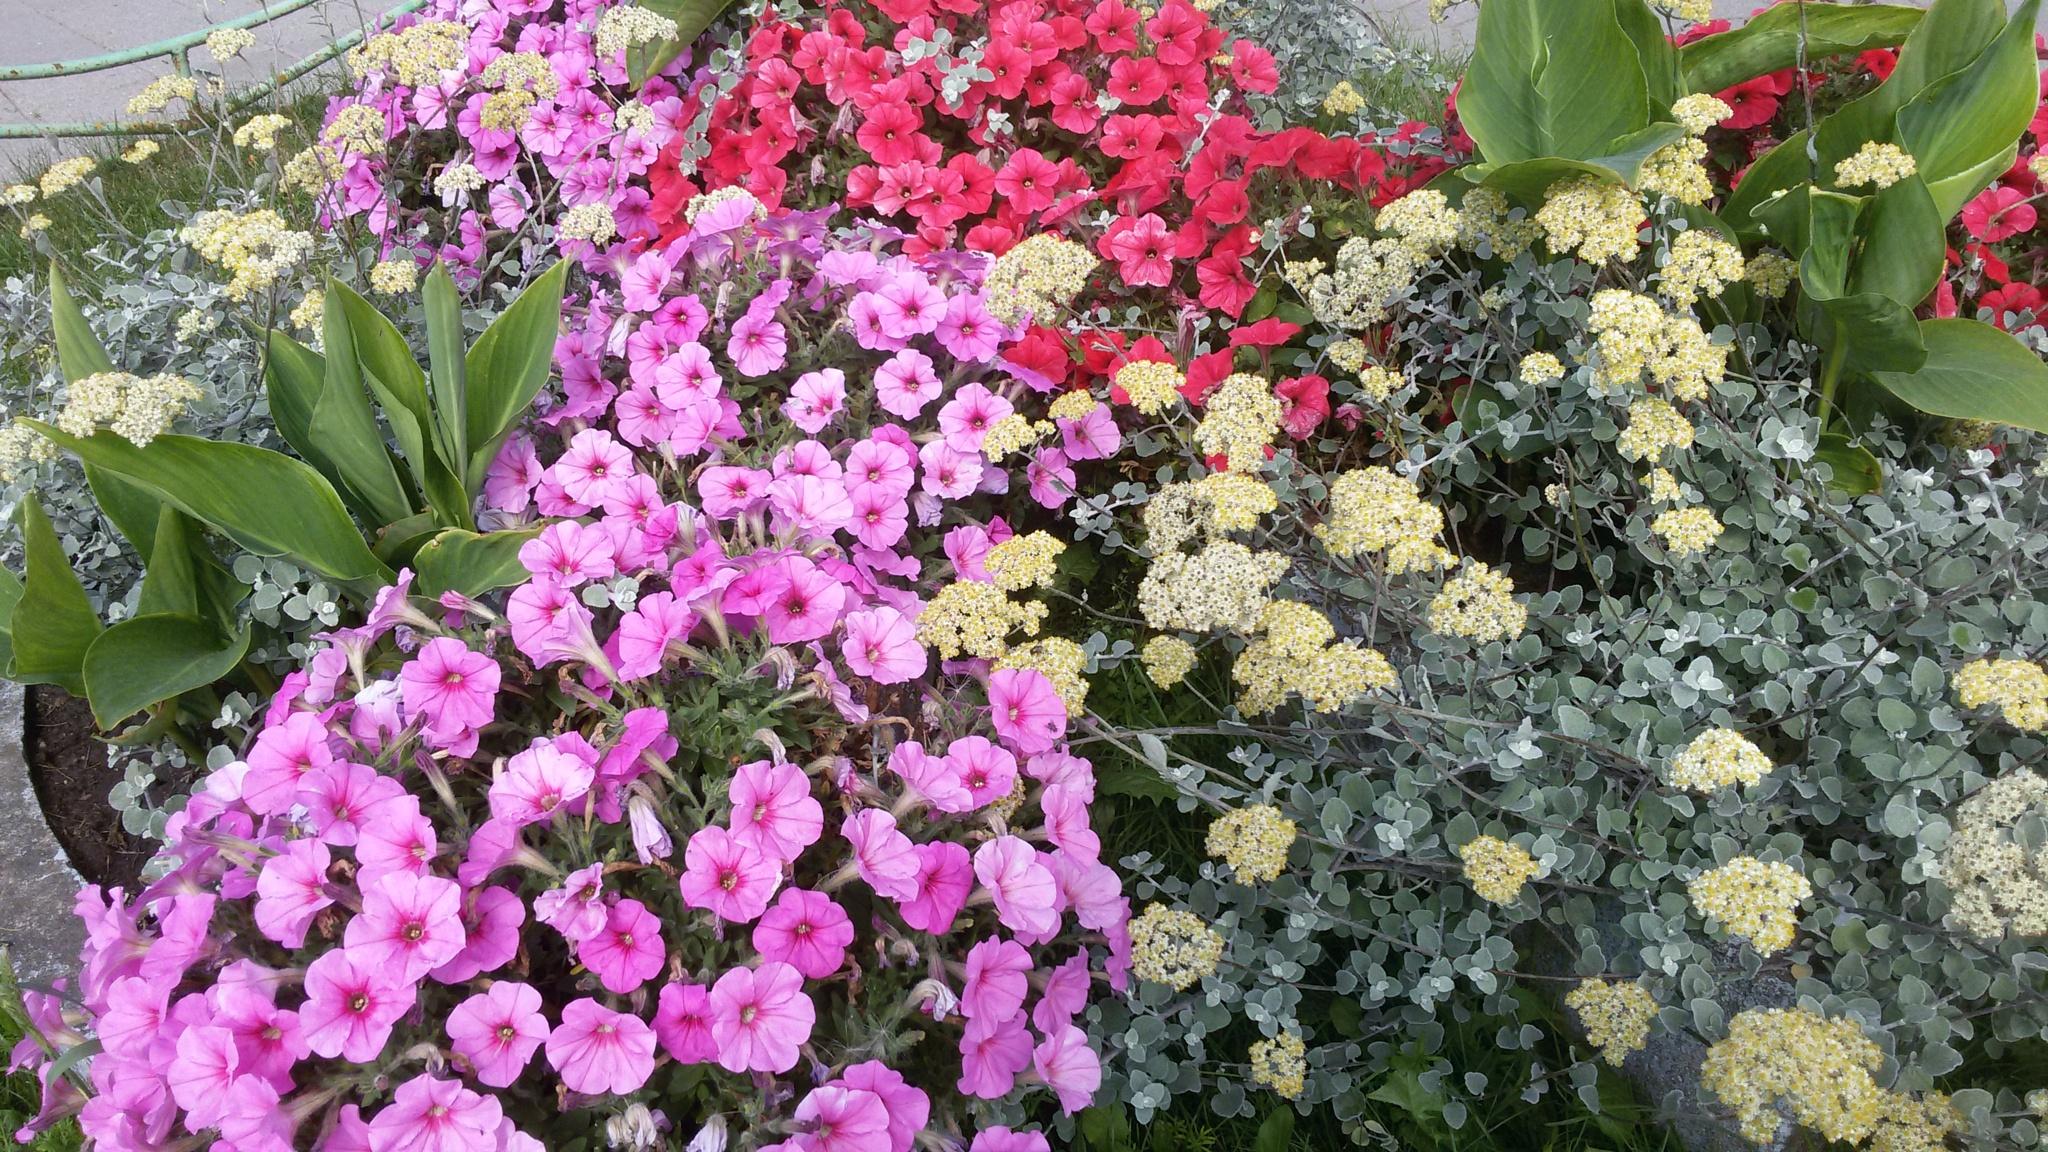 Many flowers. by uzkuraitiene62